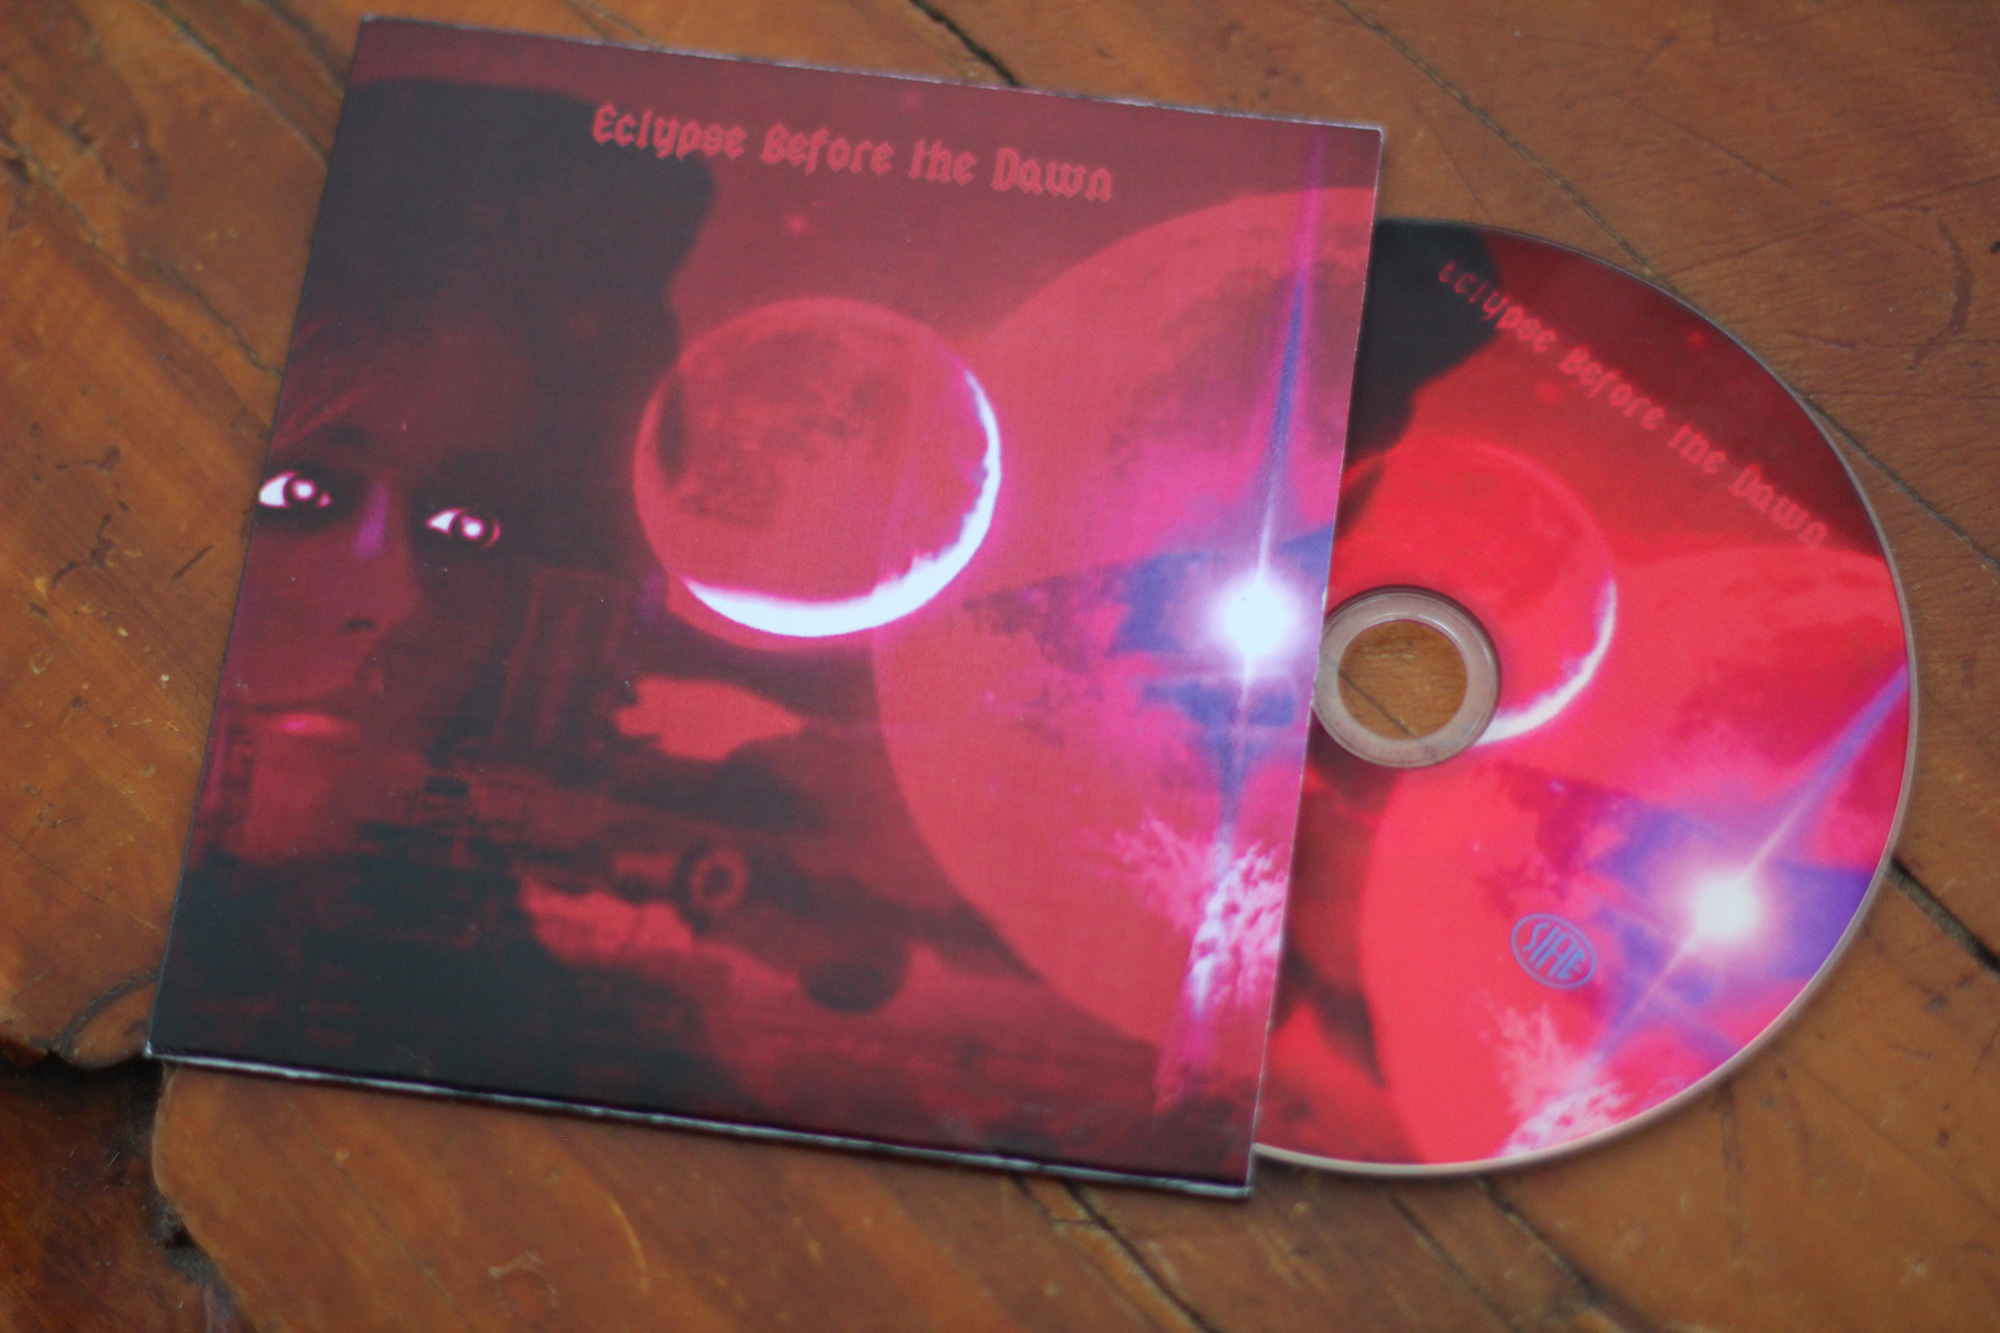 dawn-cd-1